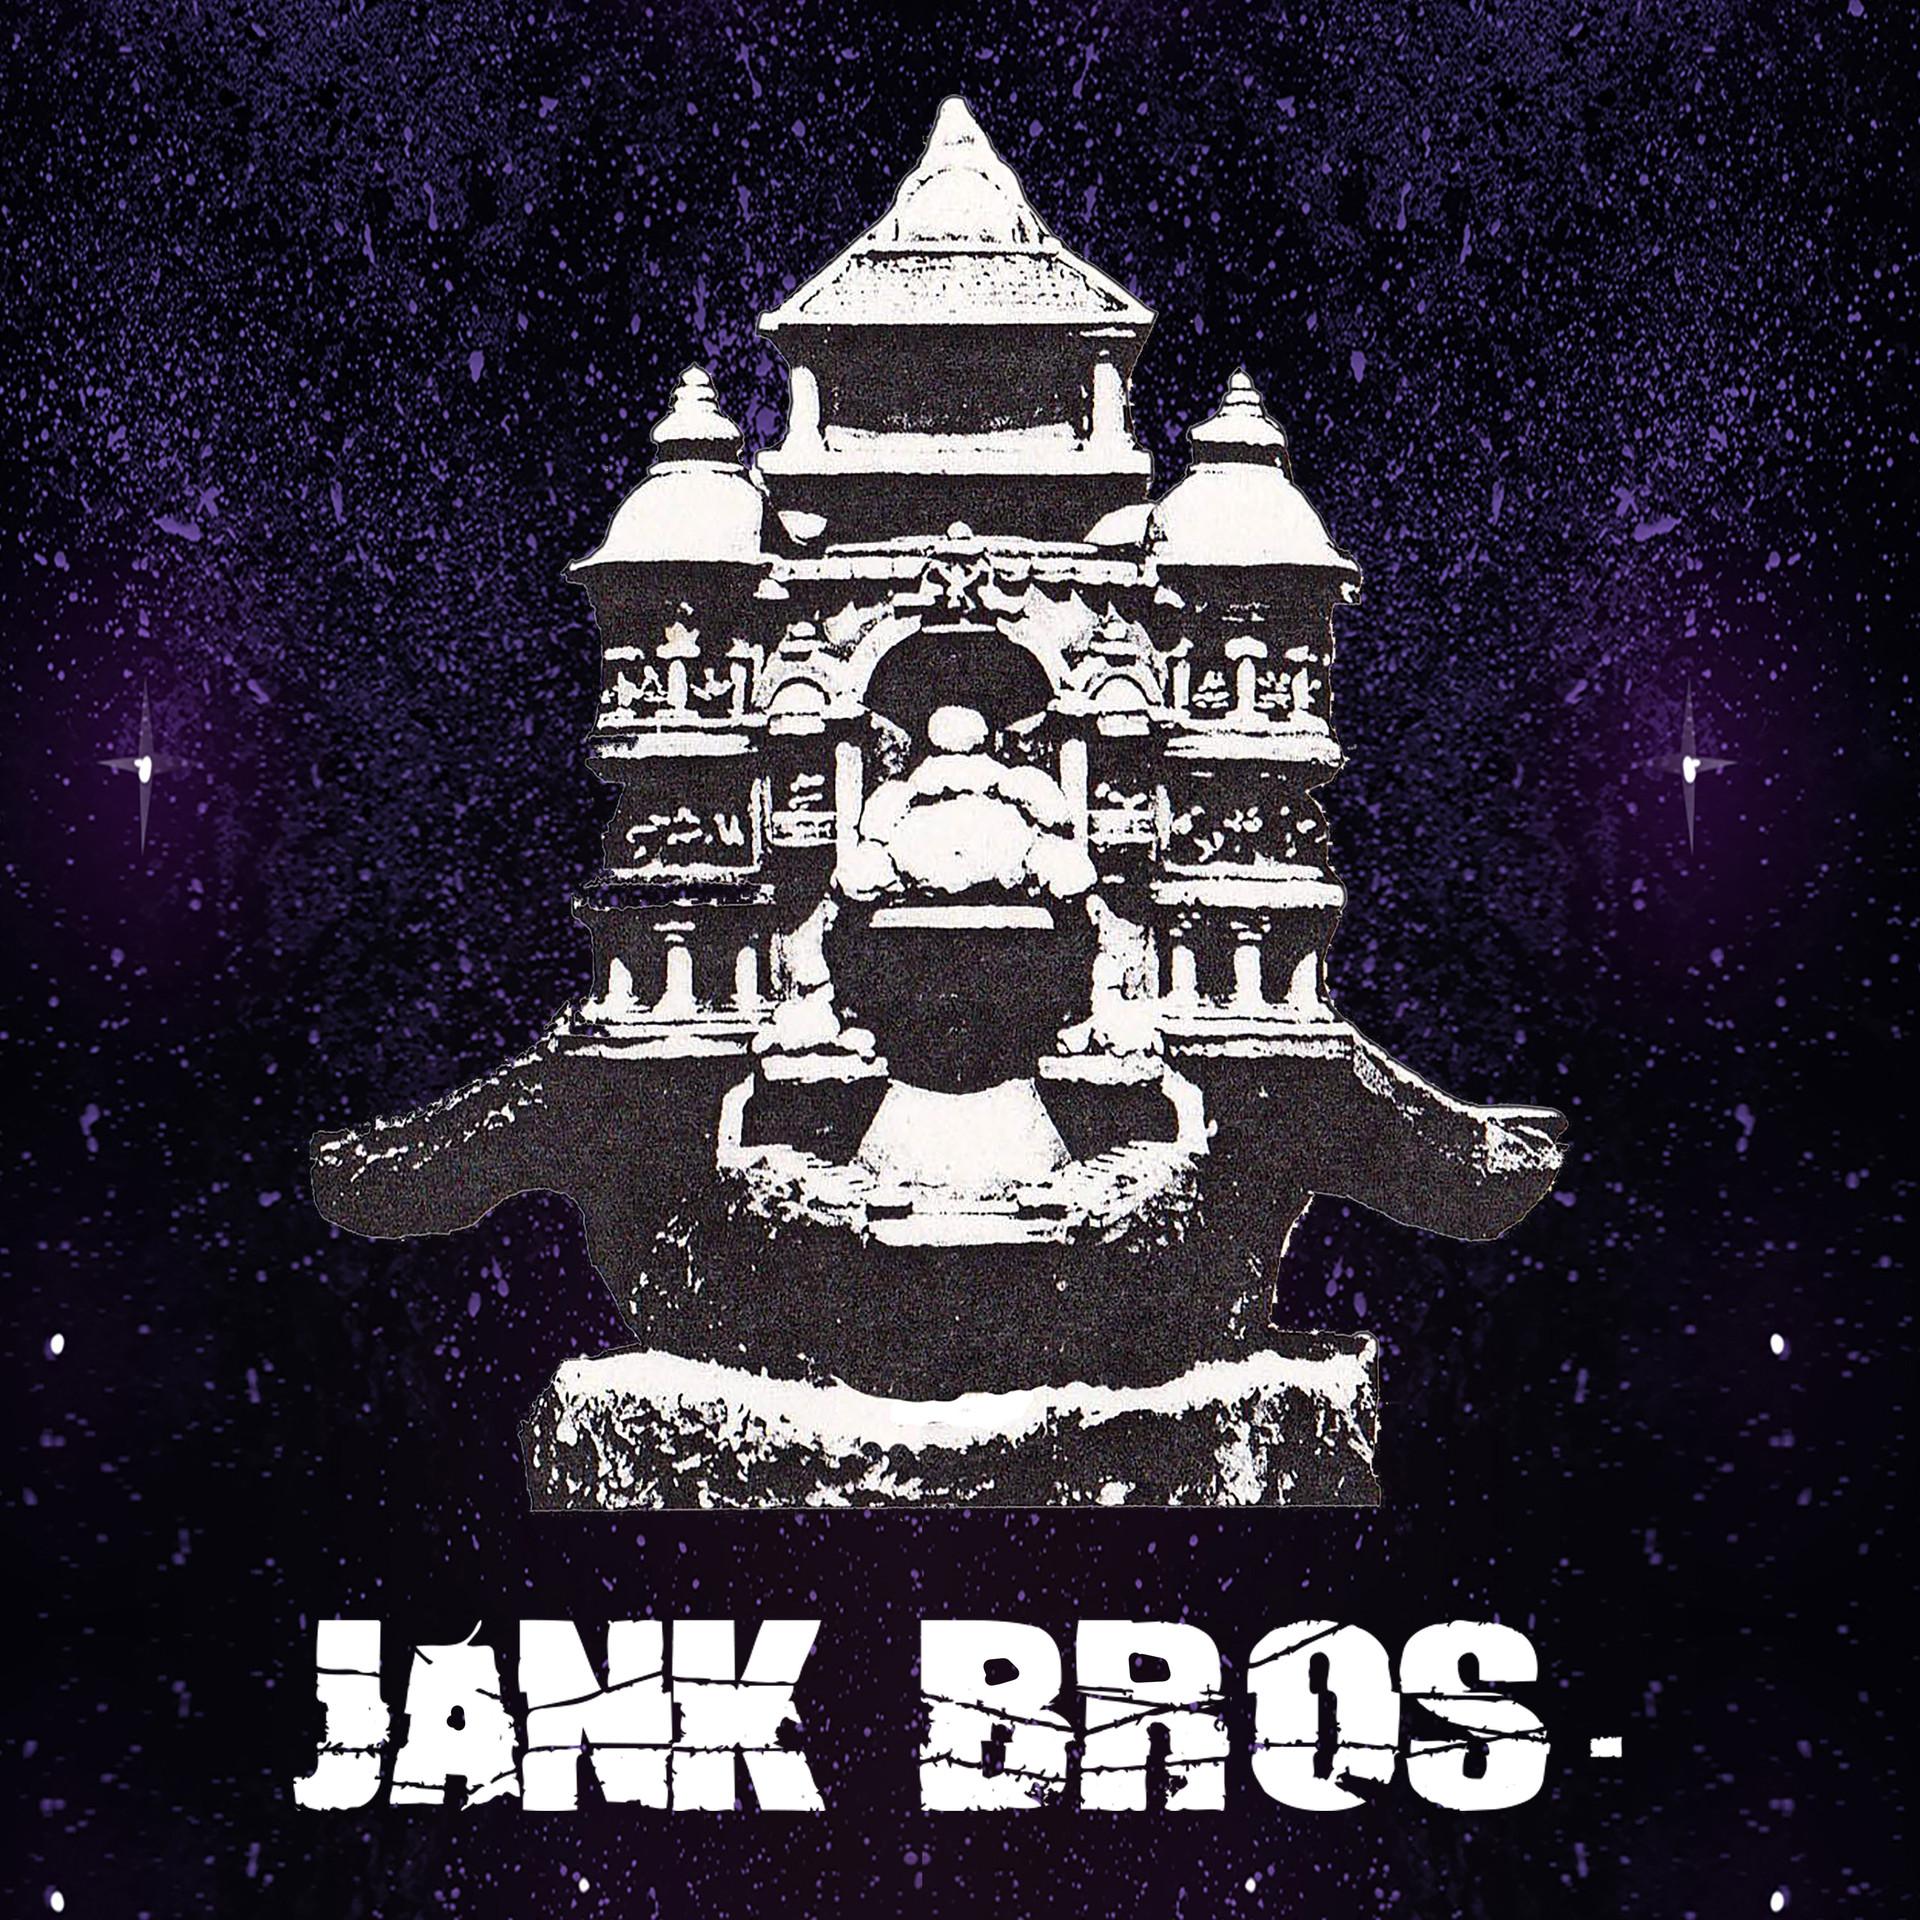 Jank_Bros_01.jpg